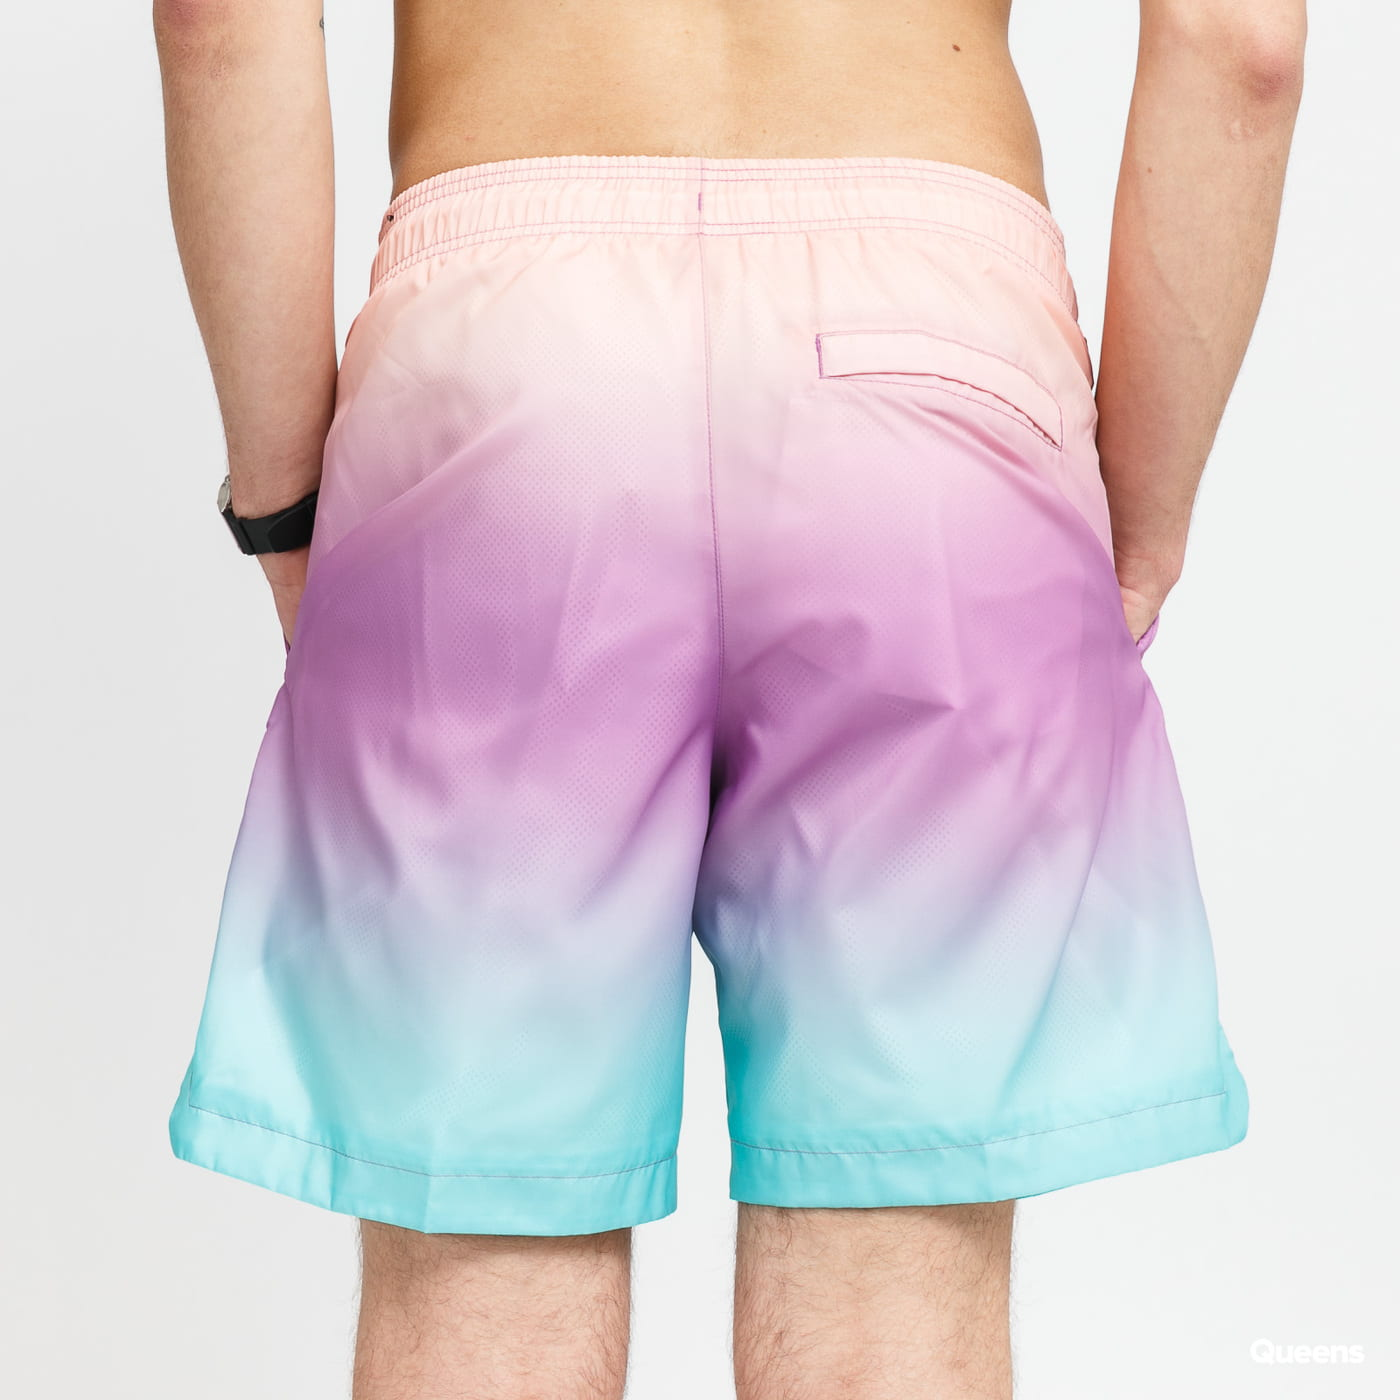 Jordan M J Sport DNA HBR Pool Short oranžové / fialové / mentolové